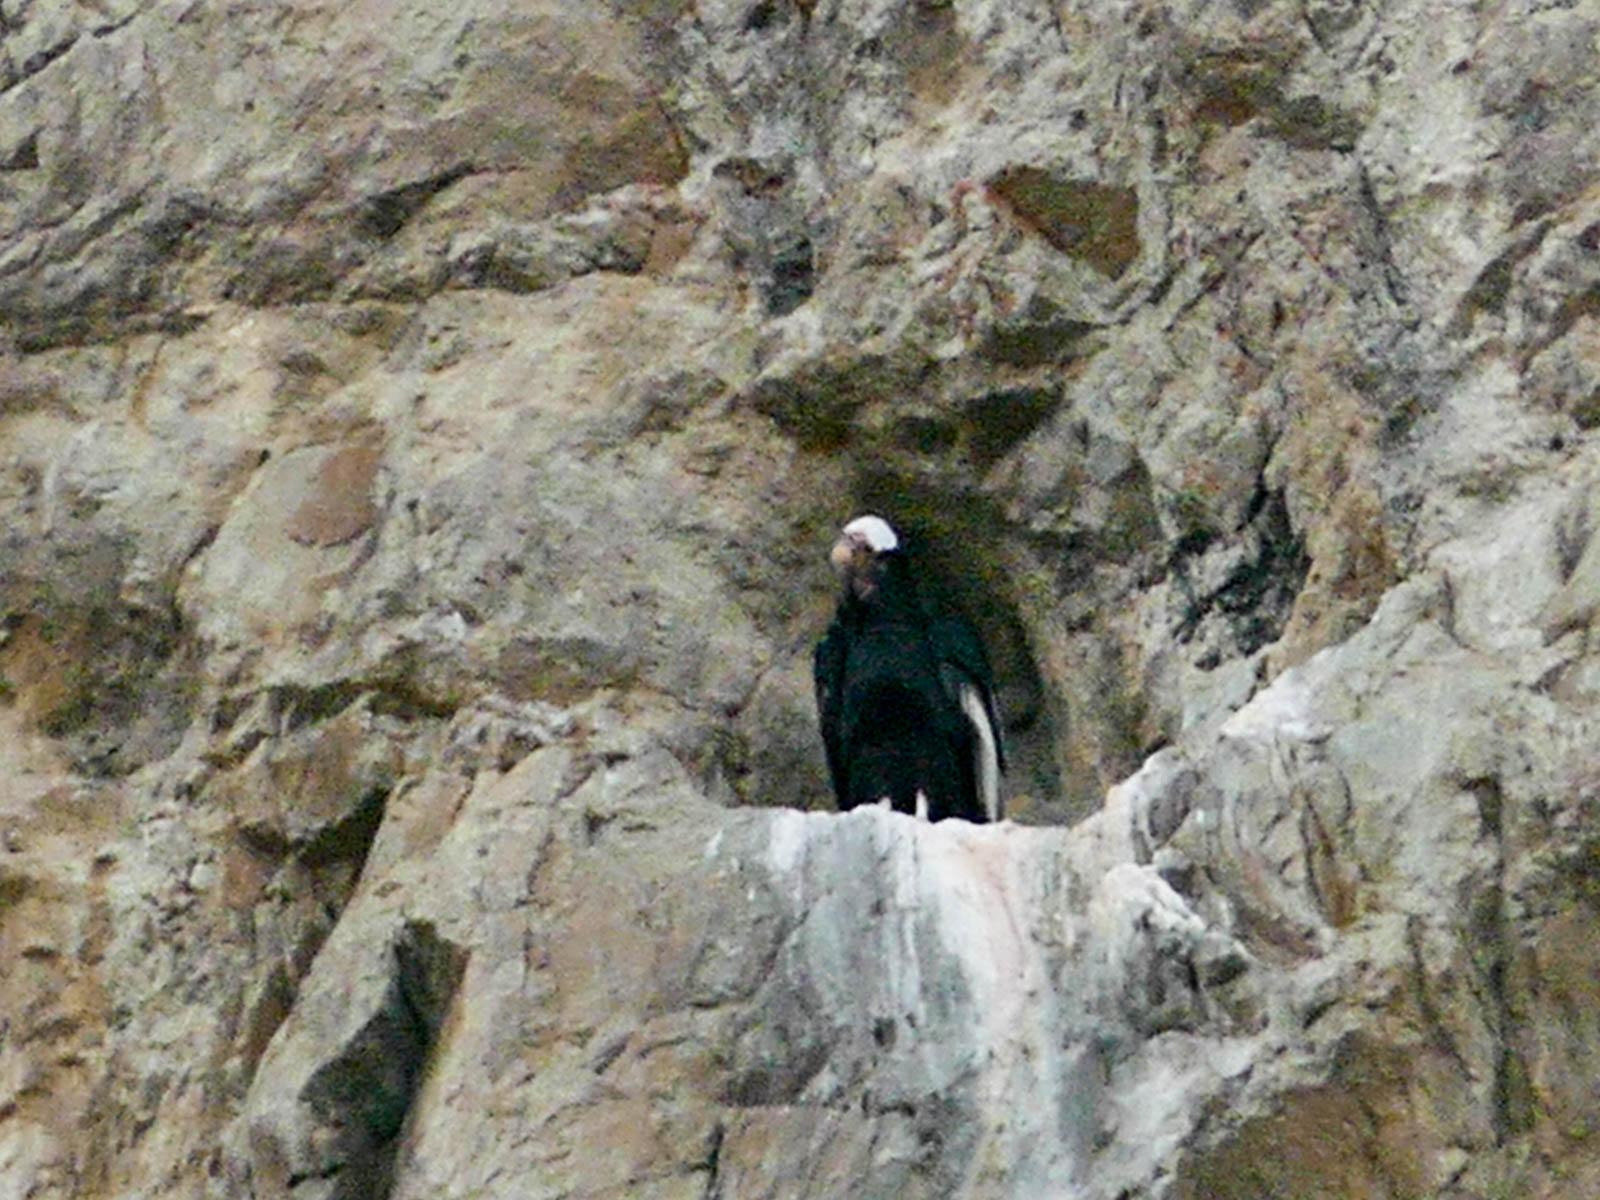 Condor on the nest on the hike to Laguna Capri in El Chalten